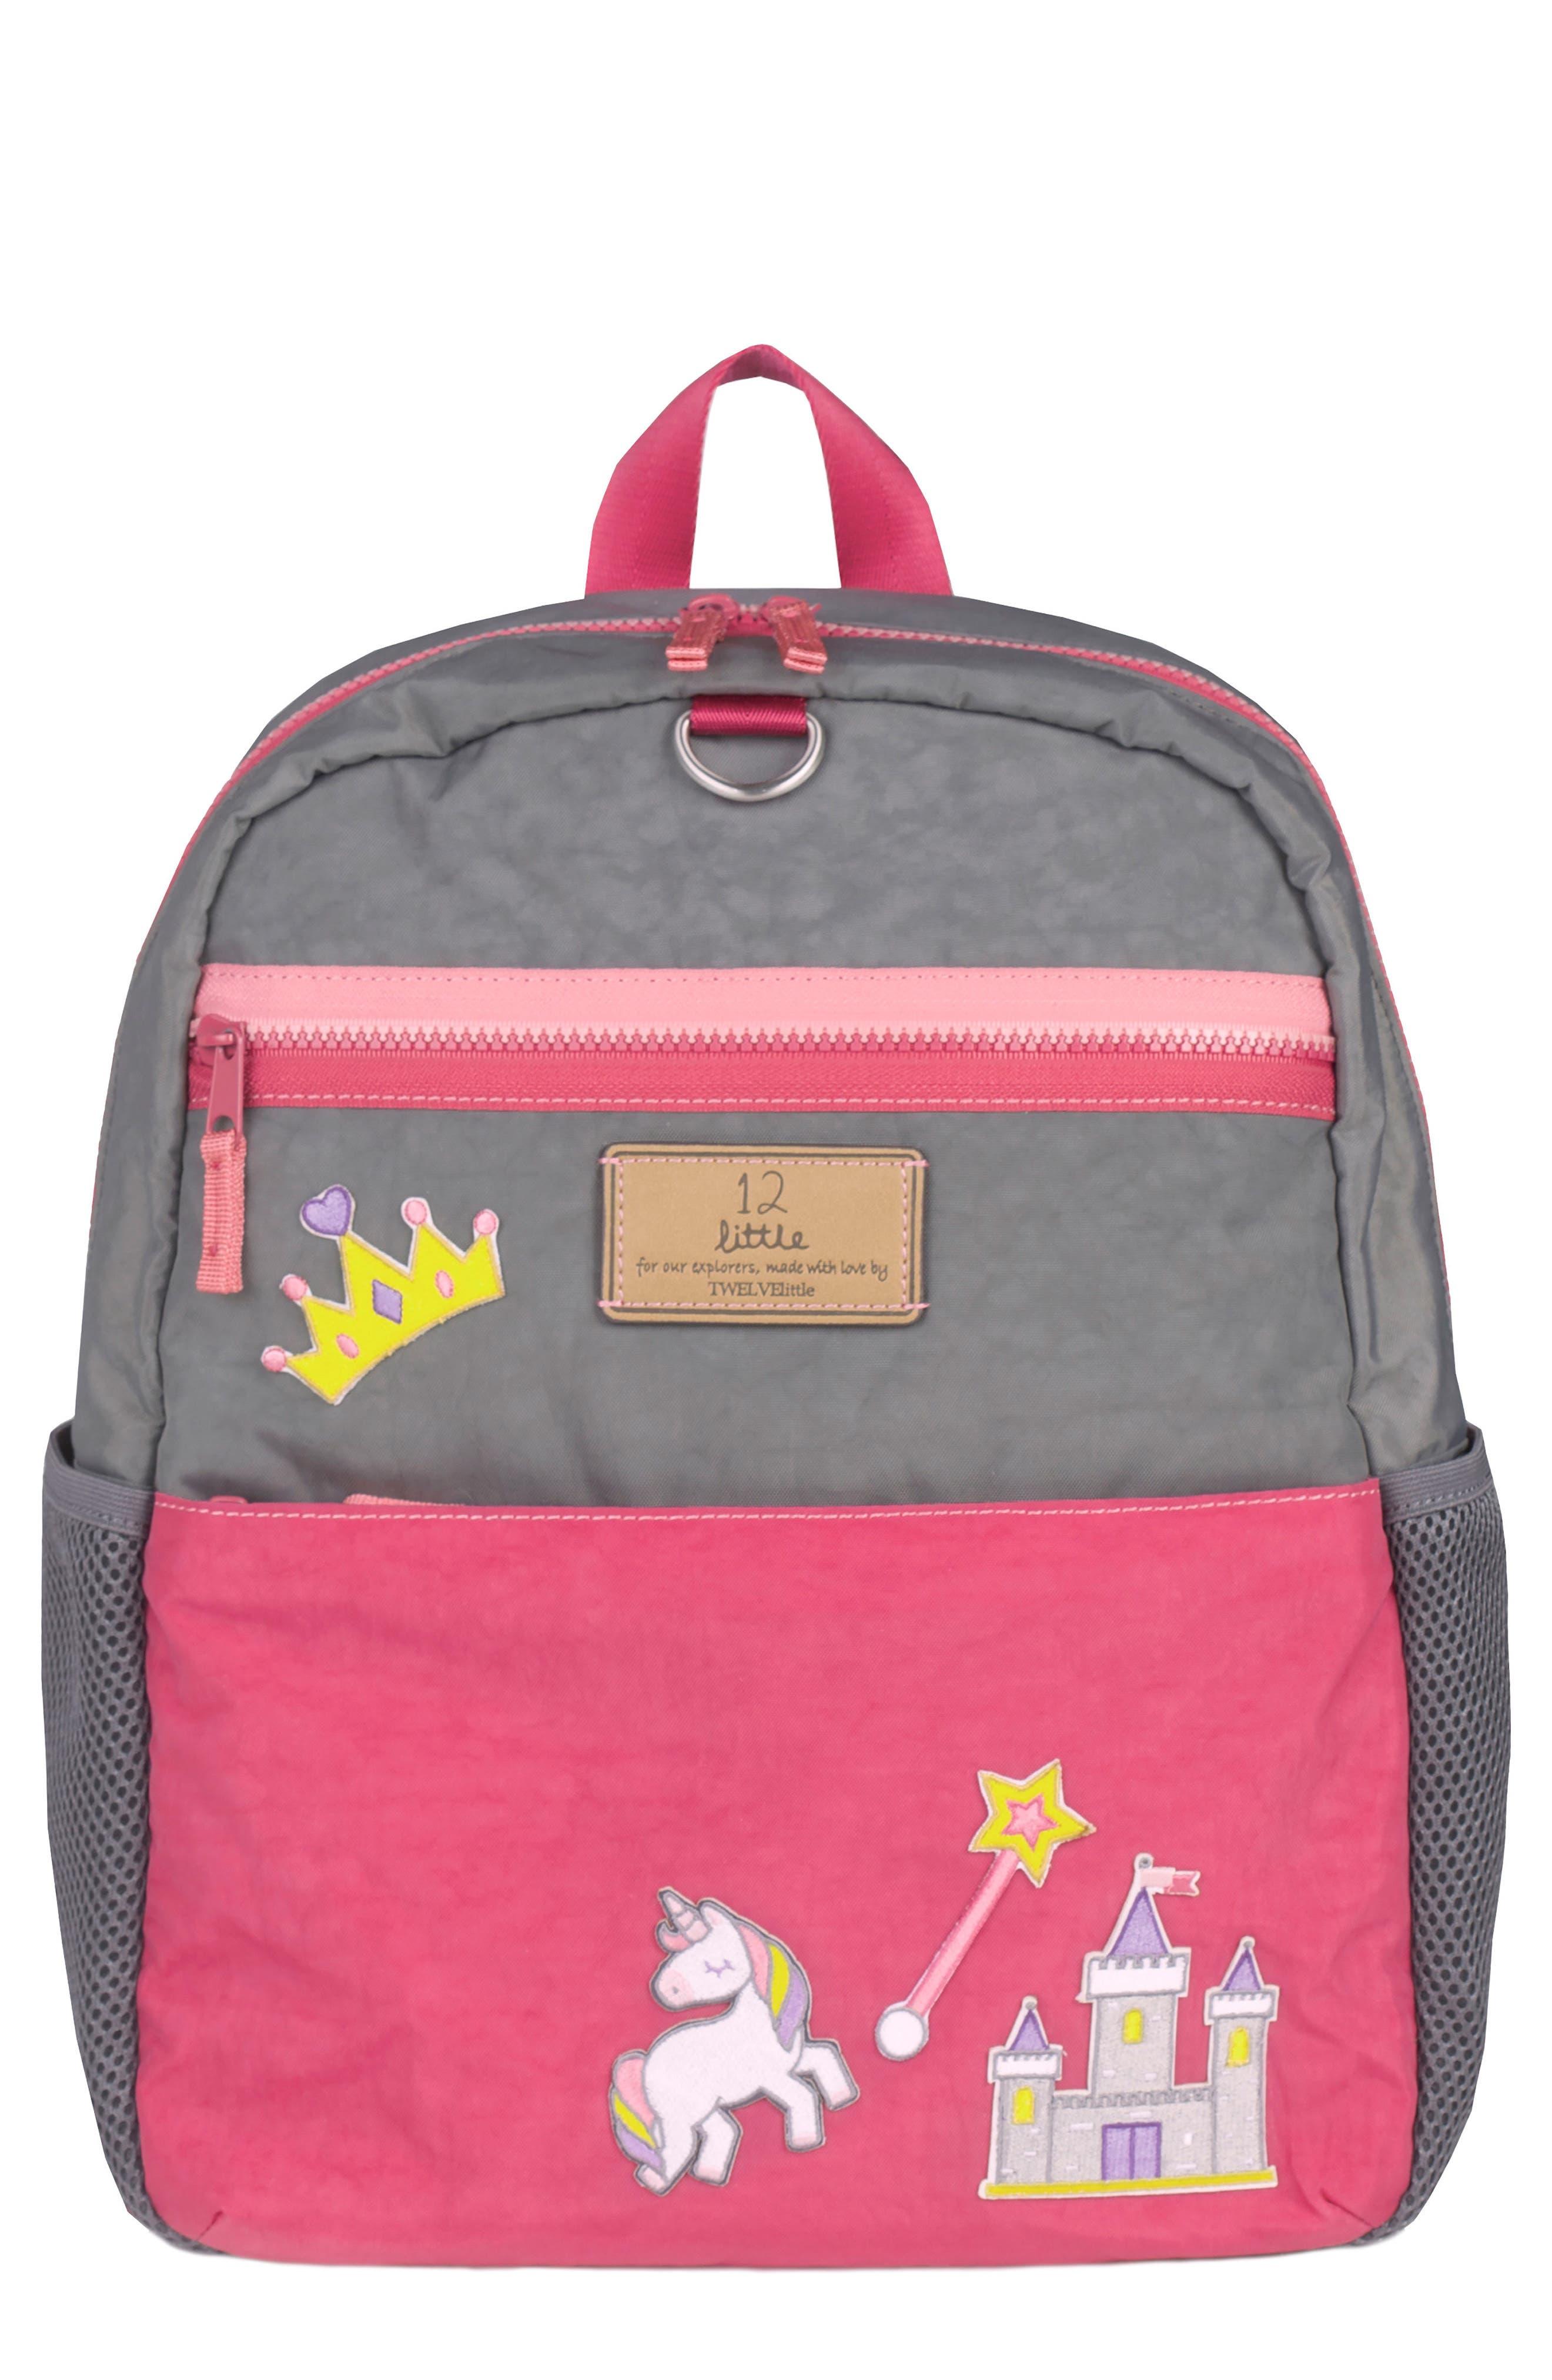 Main Image - TWELVElittle Courage Backpack (Kids)